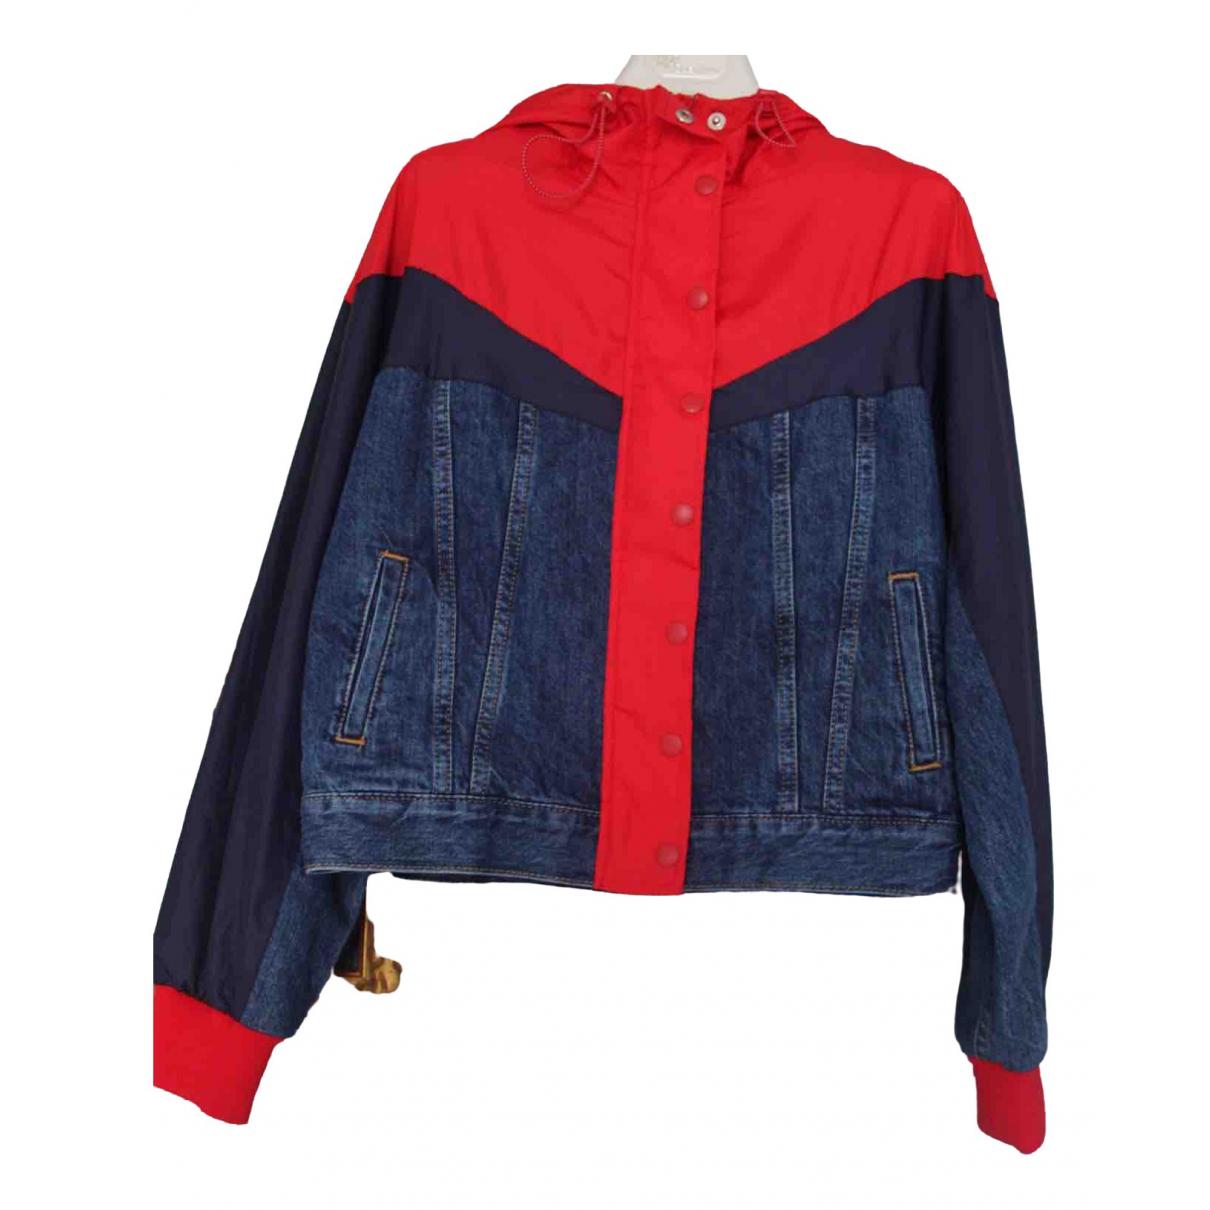 Levi's \N jacket for Women XS International